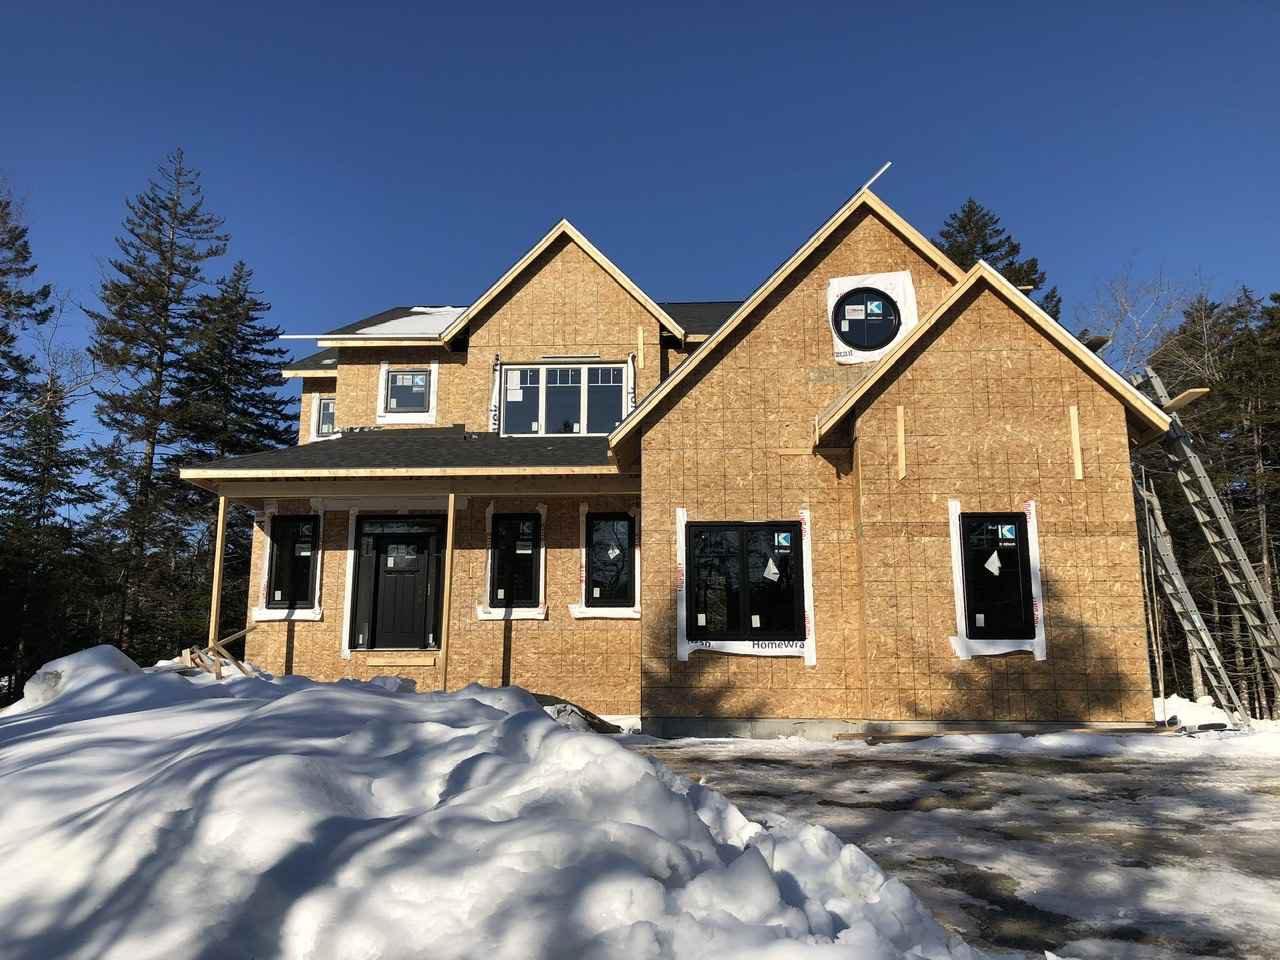 Main Photo: Lot 617 70 Gaspereau Run in Middle Sackville: 26-Beaverbank, Upper Sackville Residential for sale (Halifax-Dartmouth)  : MLS®# 202001842